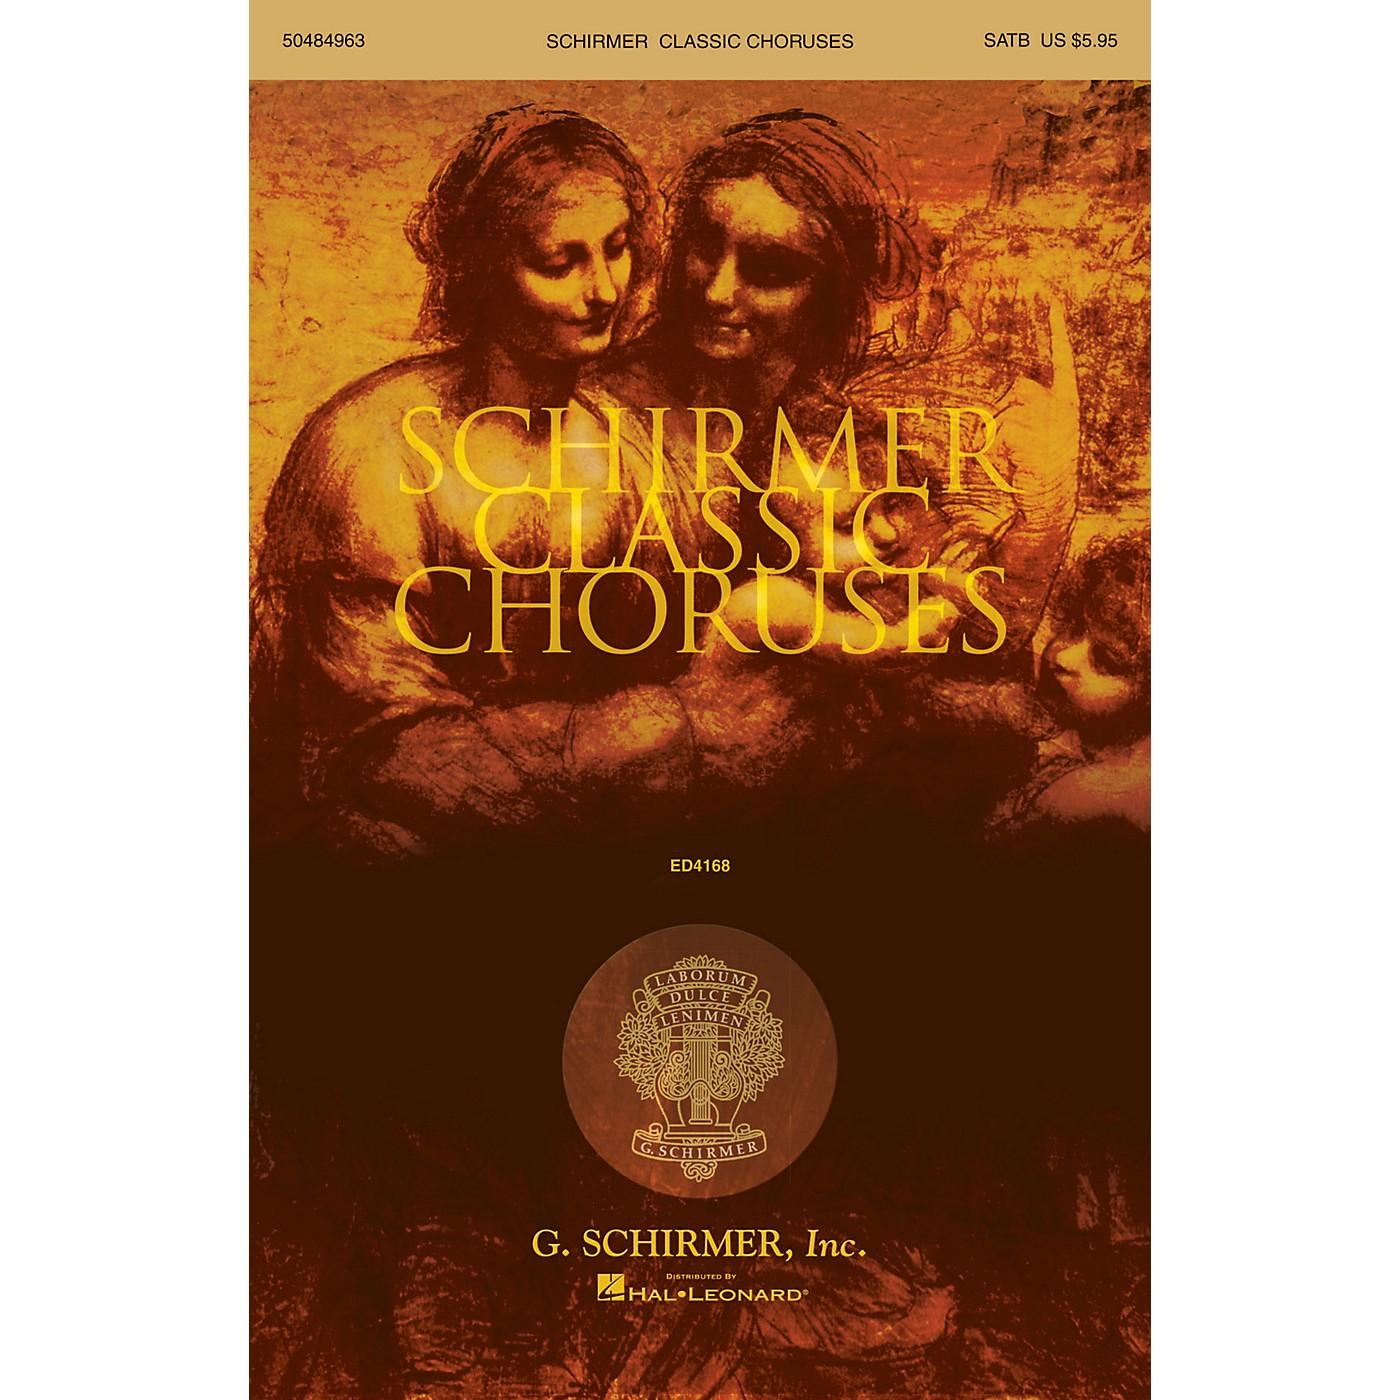 G. Schirmer Schirmer Classic Choruses (SATB collection) thumbnail